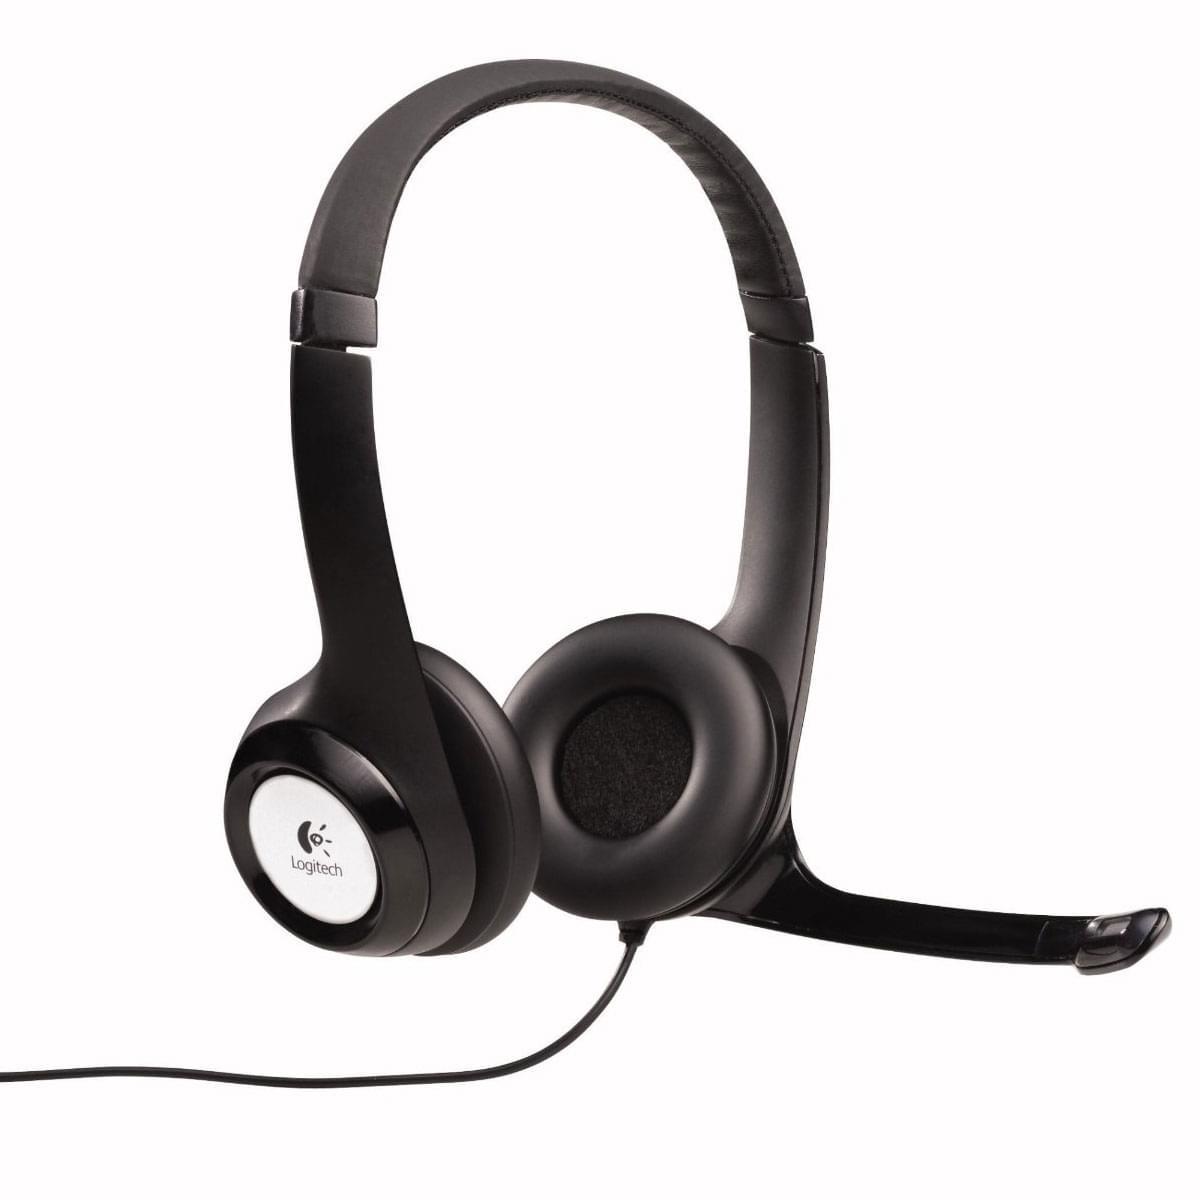 Logitech USB Headset H390 Stereo Noir - Micro-casque - Cybertek.fr - 0